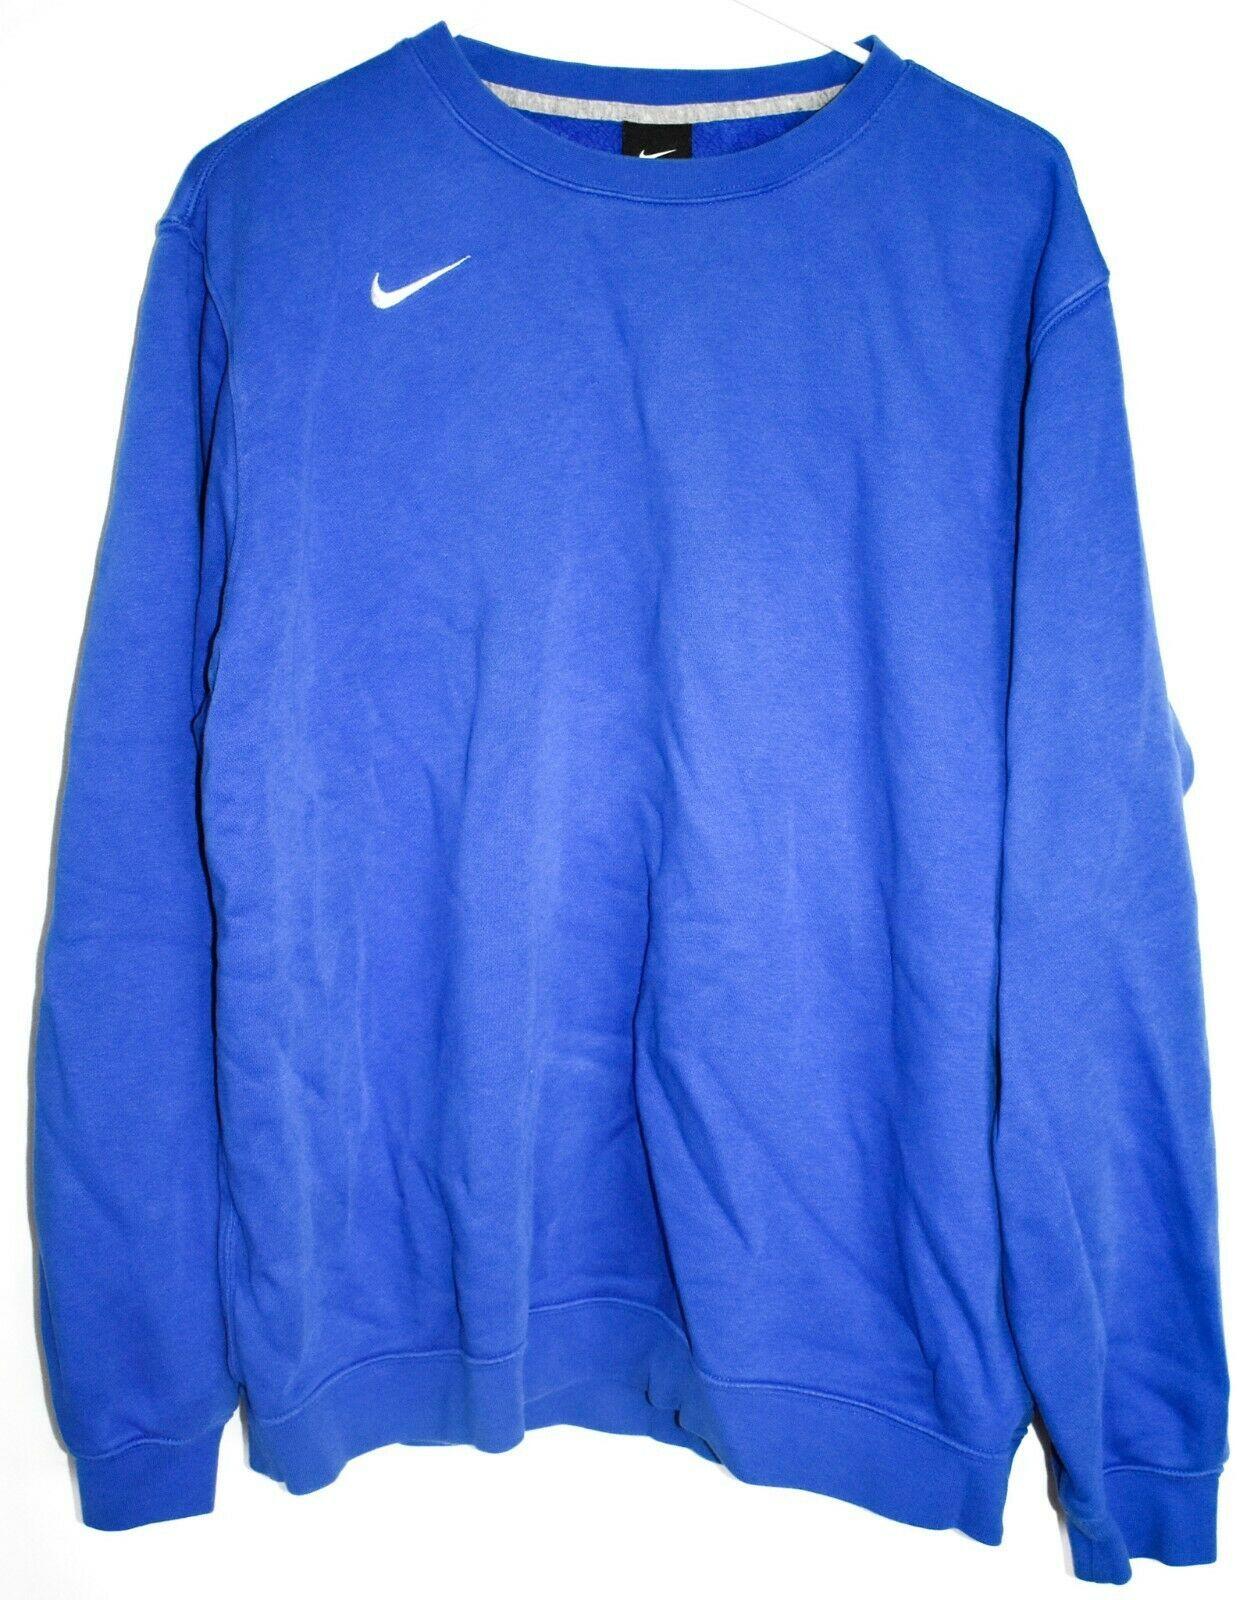 Nike Men's Blue Pullover Crew Neck Club Fleece Sweatshirt Embroidered Swoosh L